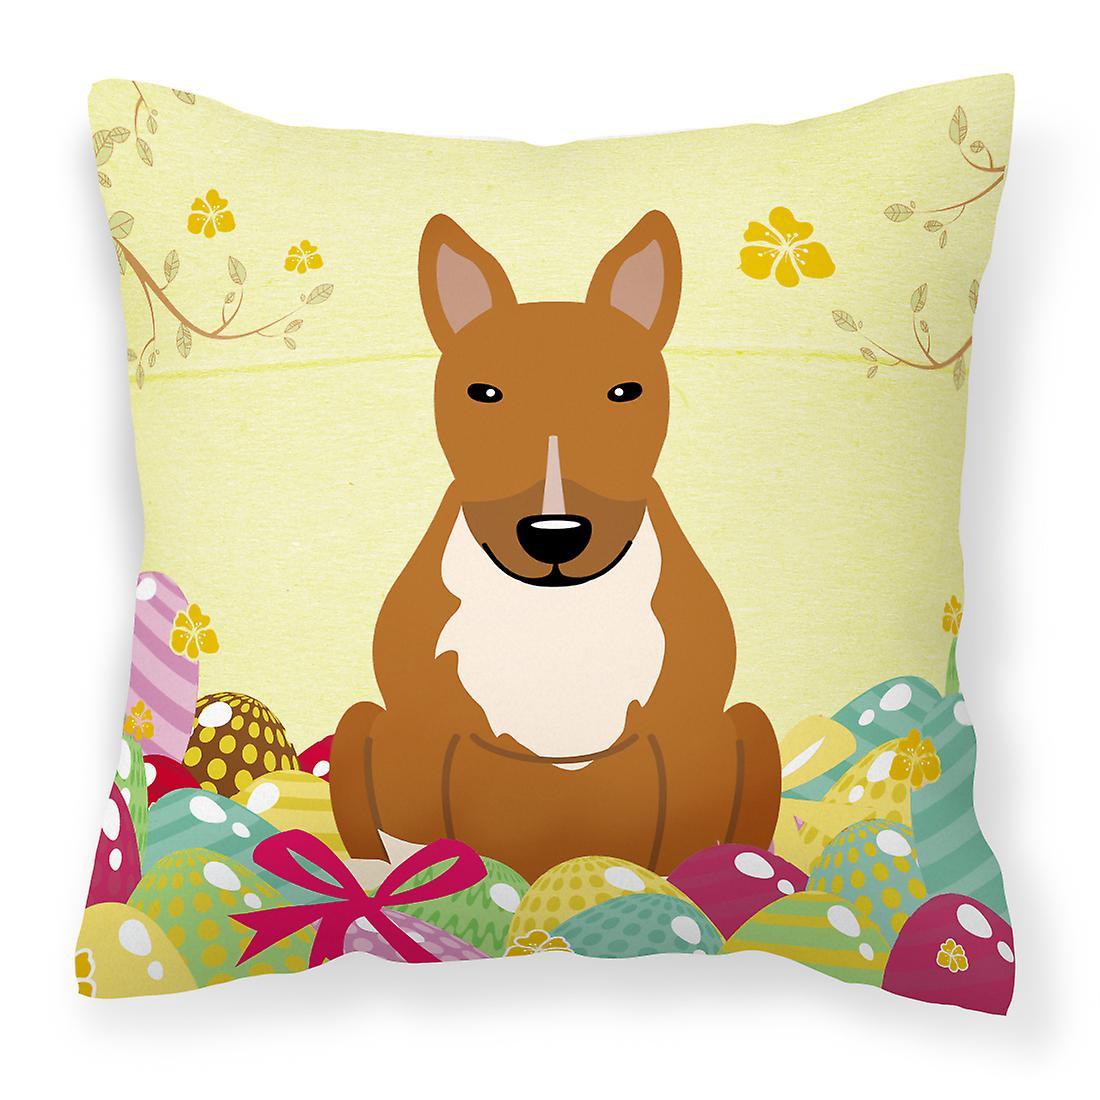 Oeufs de Pâques Bull Terrier rouge tissu oreiller décoratif